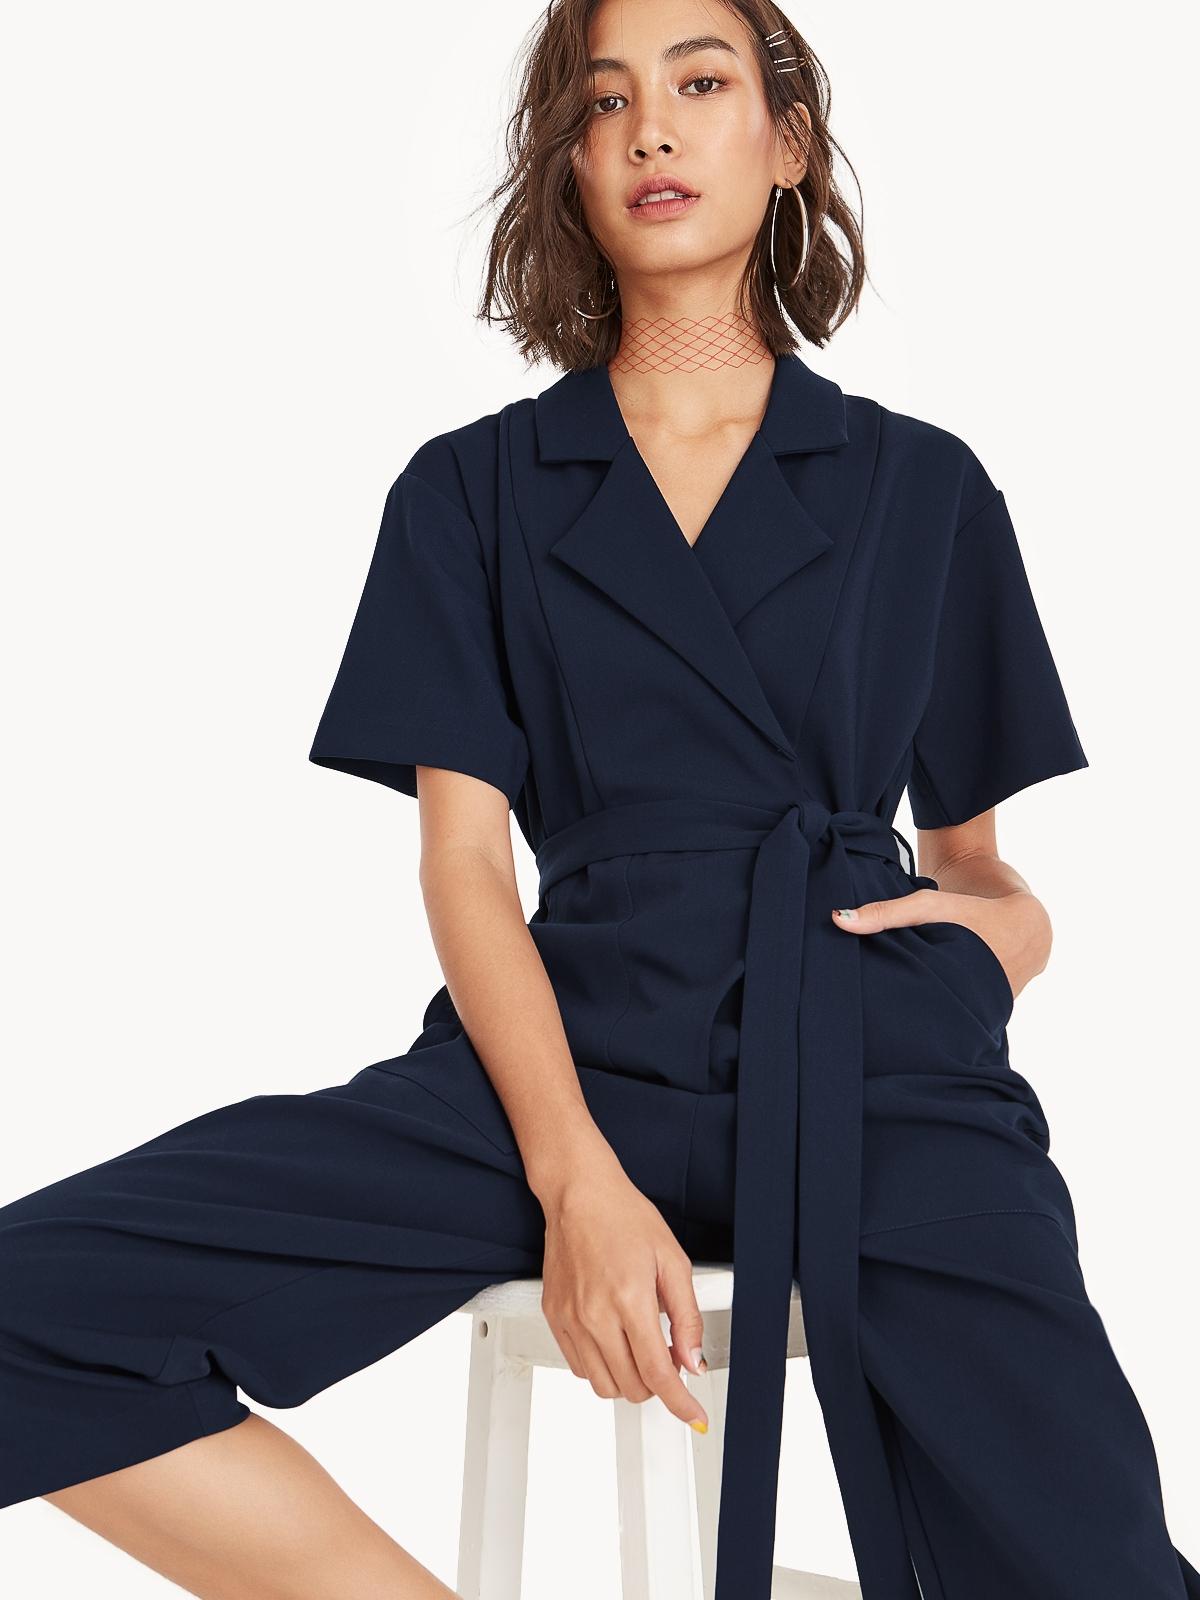 03942dfc718 Arden Short Sleeve Jumpsuit - Navy - Pomelo Fashion